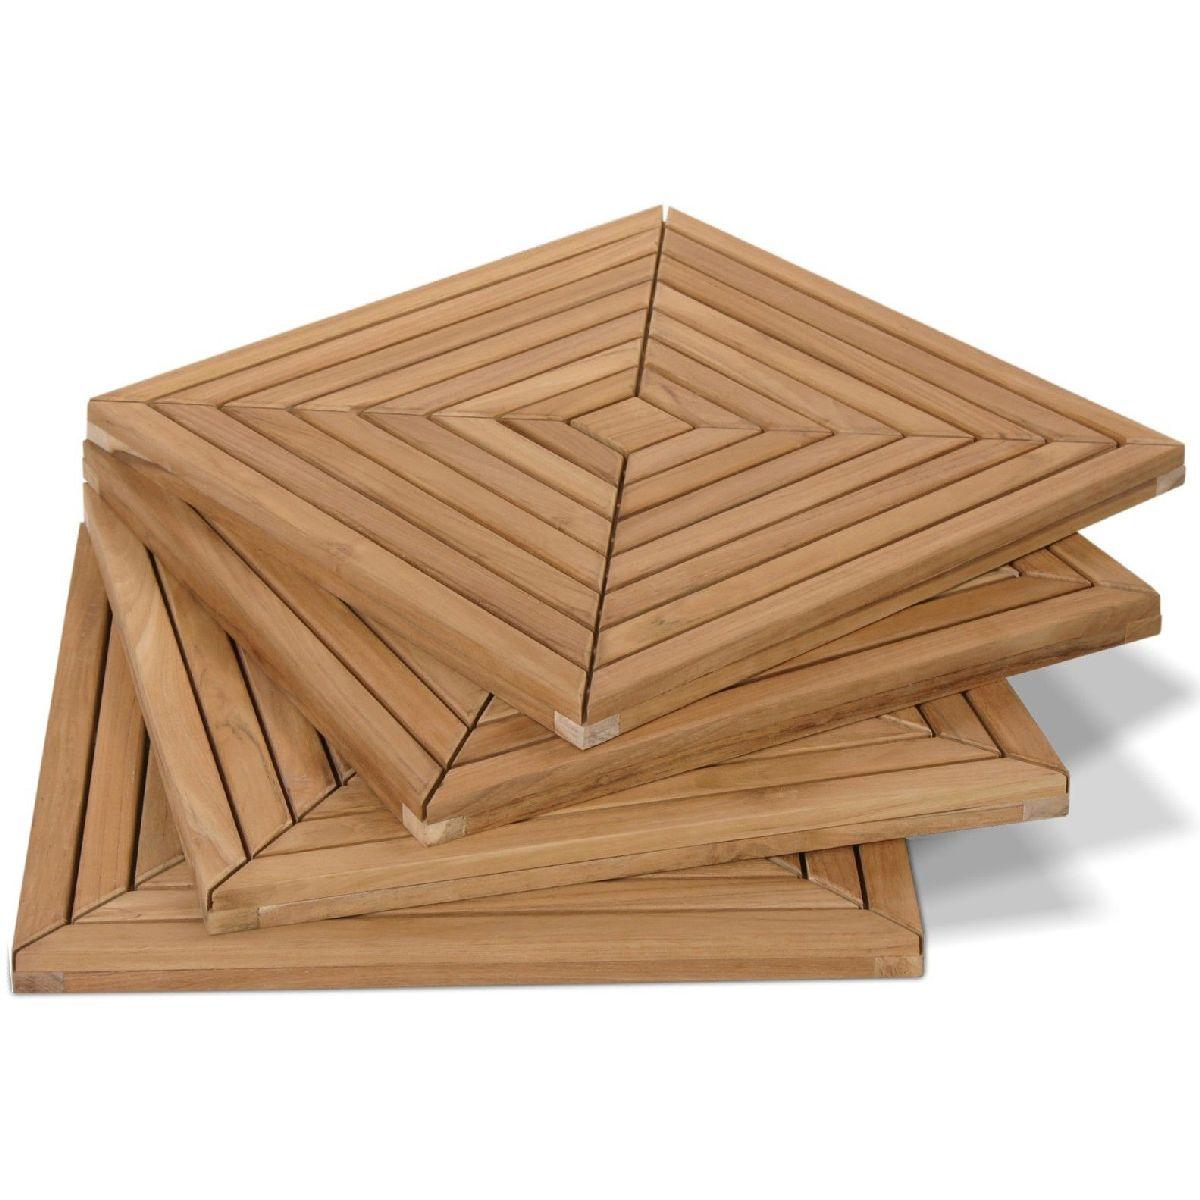 Outdoor Teak Garden Furniture Miscellaneous Preview | Teak Patio ...